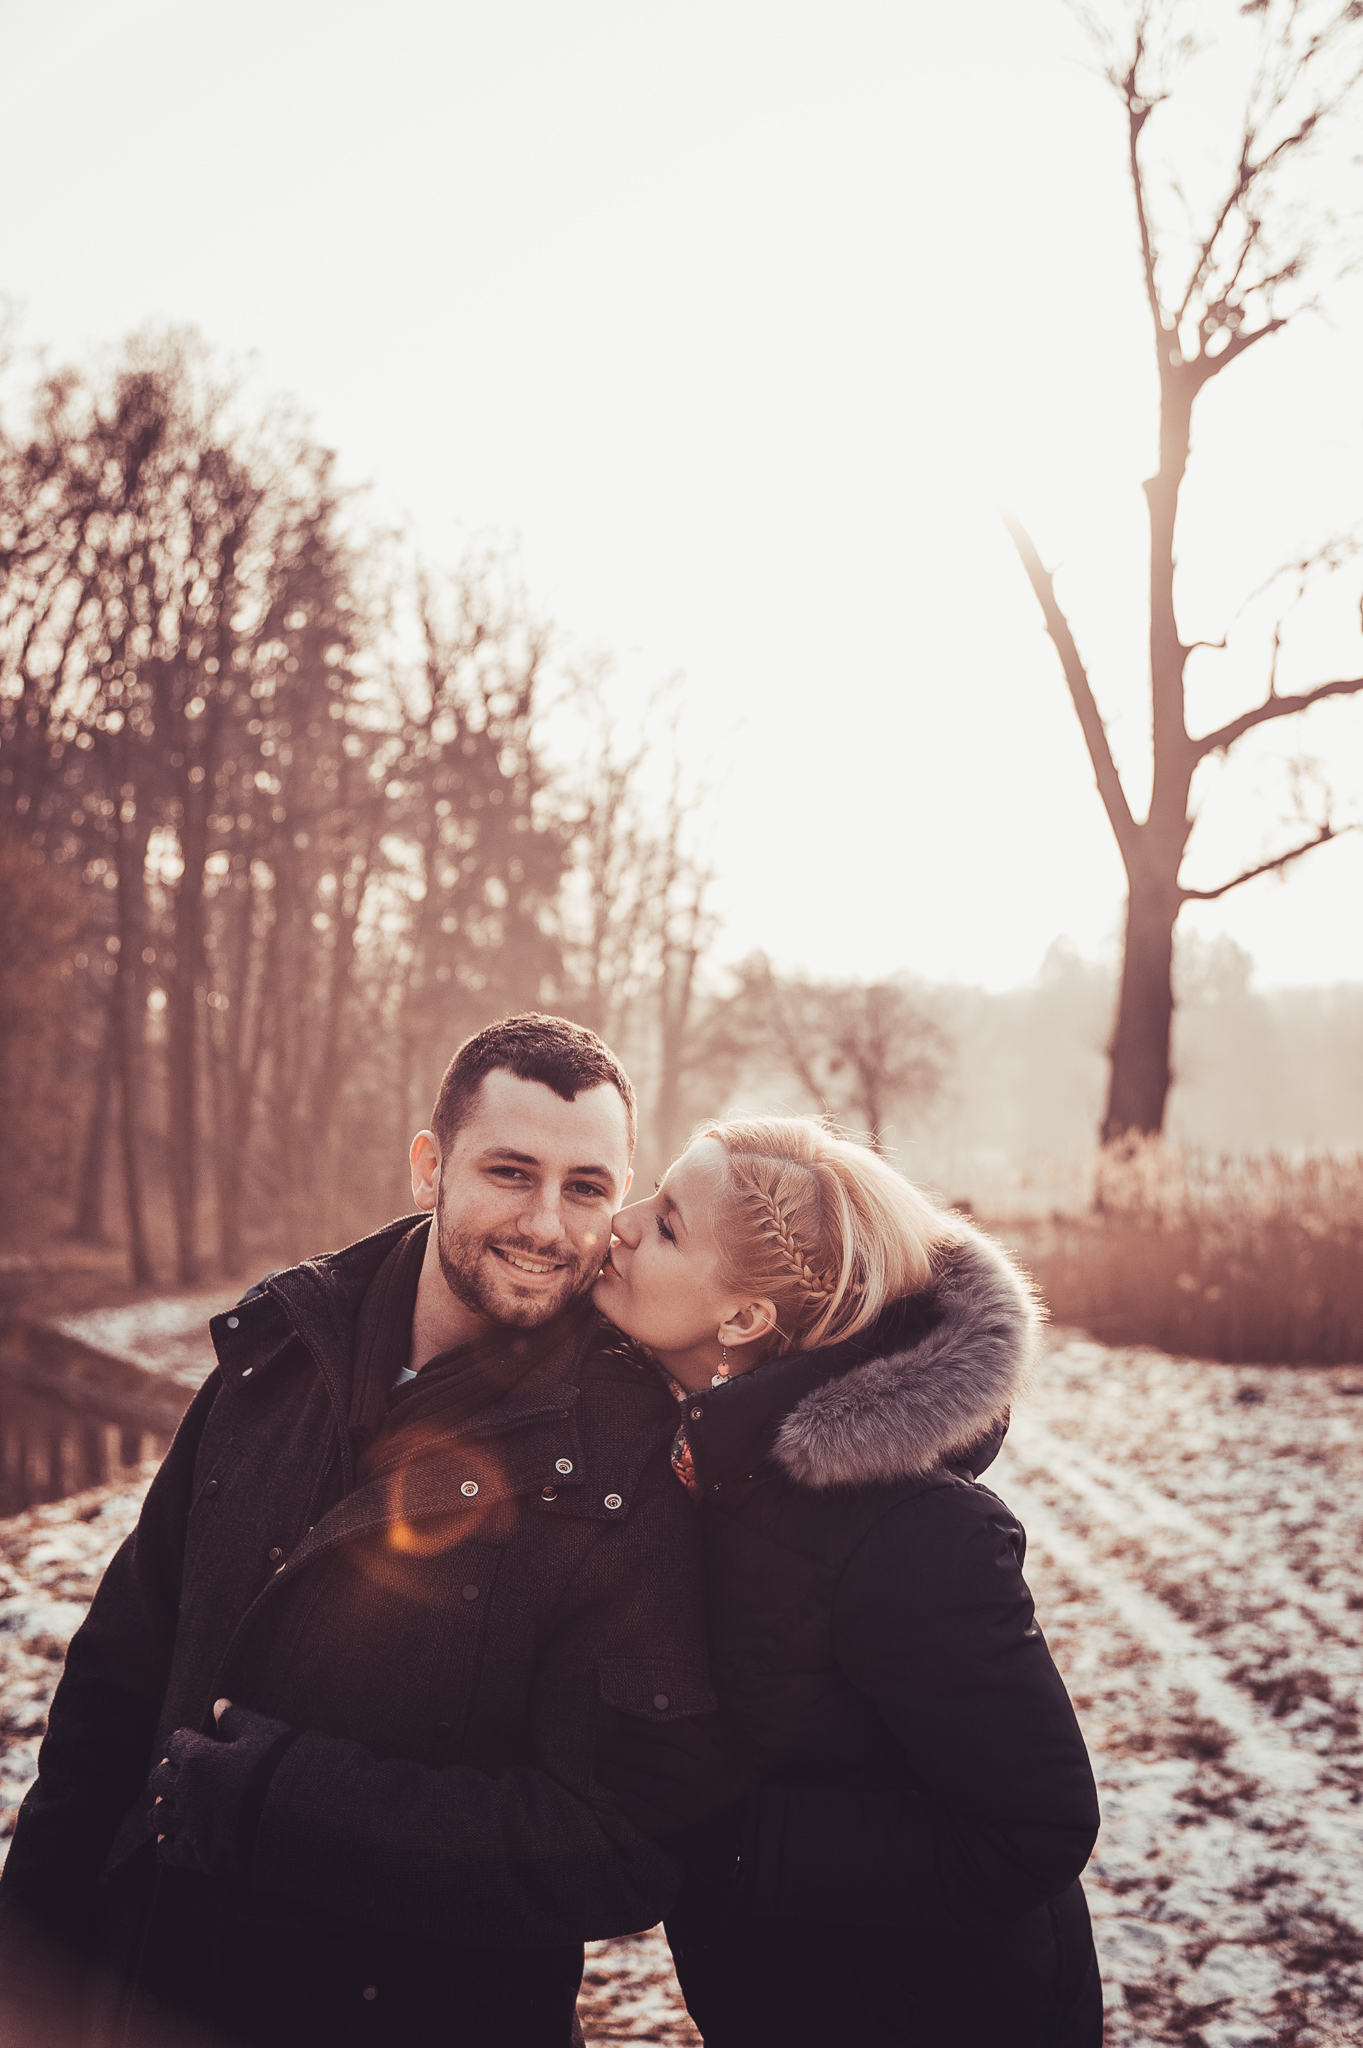 0153_Klaudia&Konrad________sesja_narzeczenska_goluchow____fotografia_slubna_www_amfoto_pl_DSC_7476.jpg